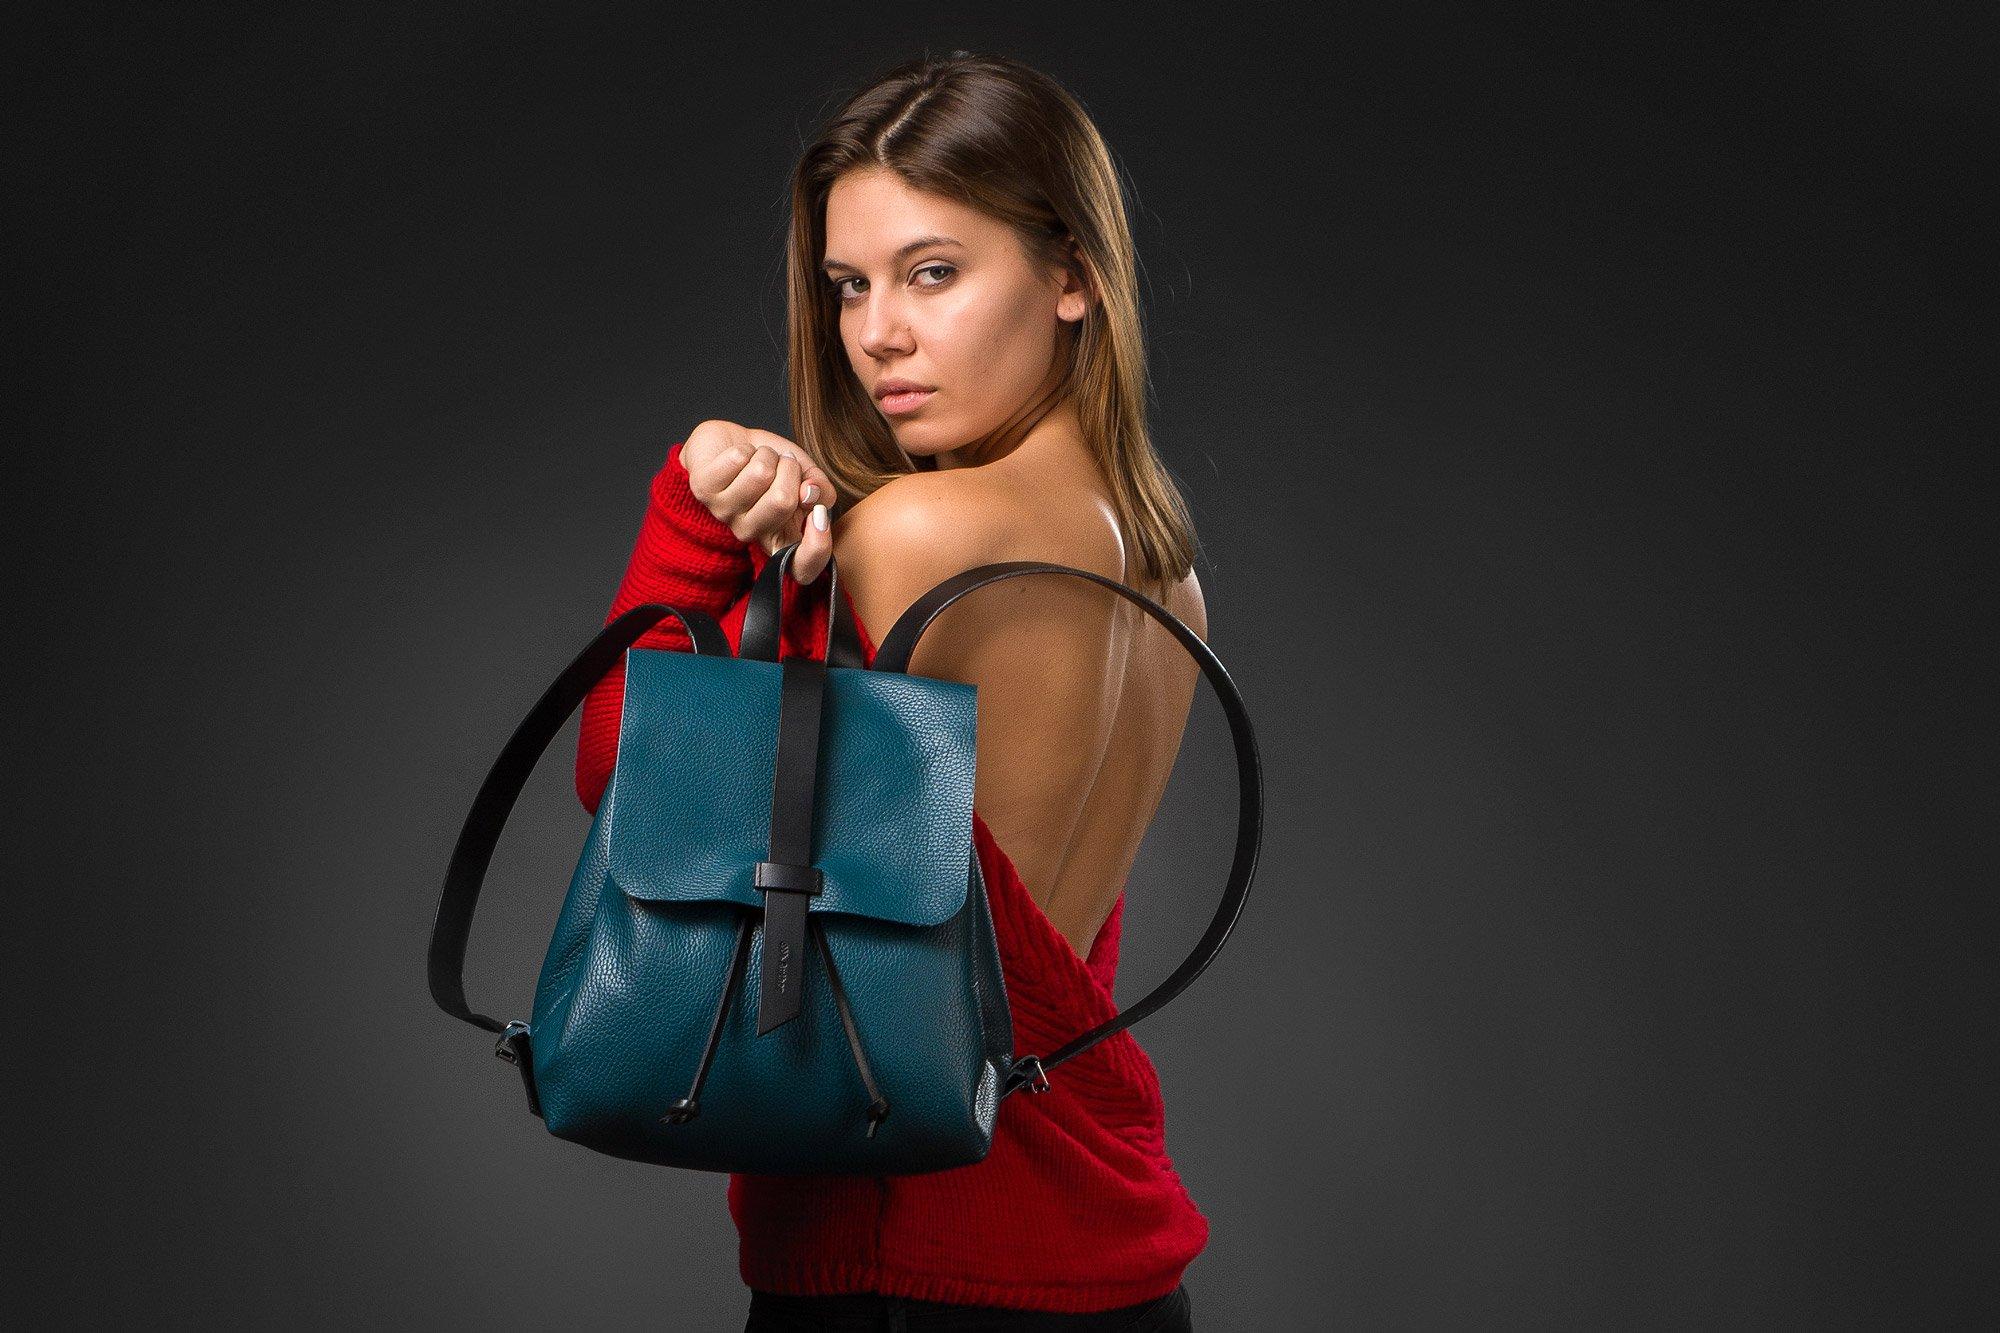 Leather Mini backpack, blue leather backpack, Leather Tote bag, blue women bag, woman small backpack, handmade backpack, womens backpack